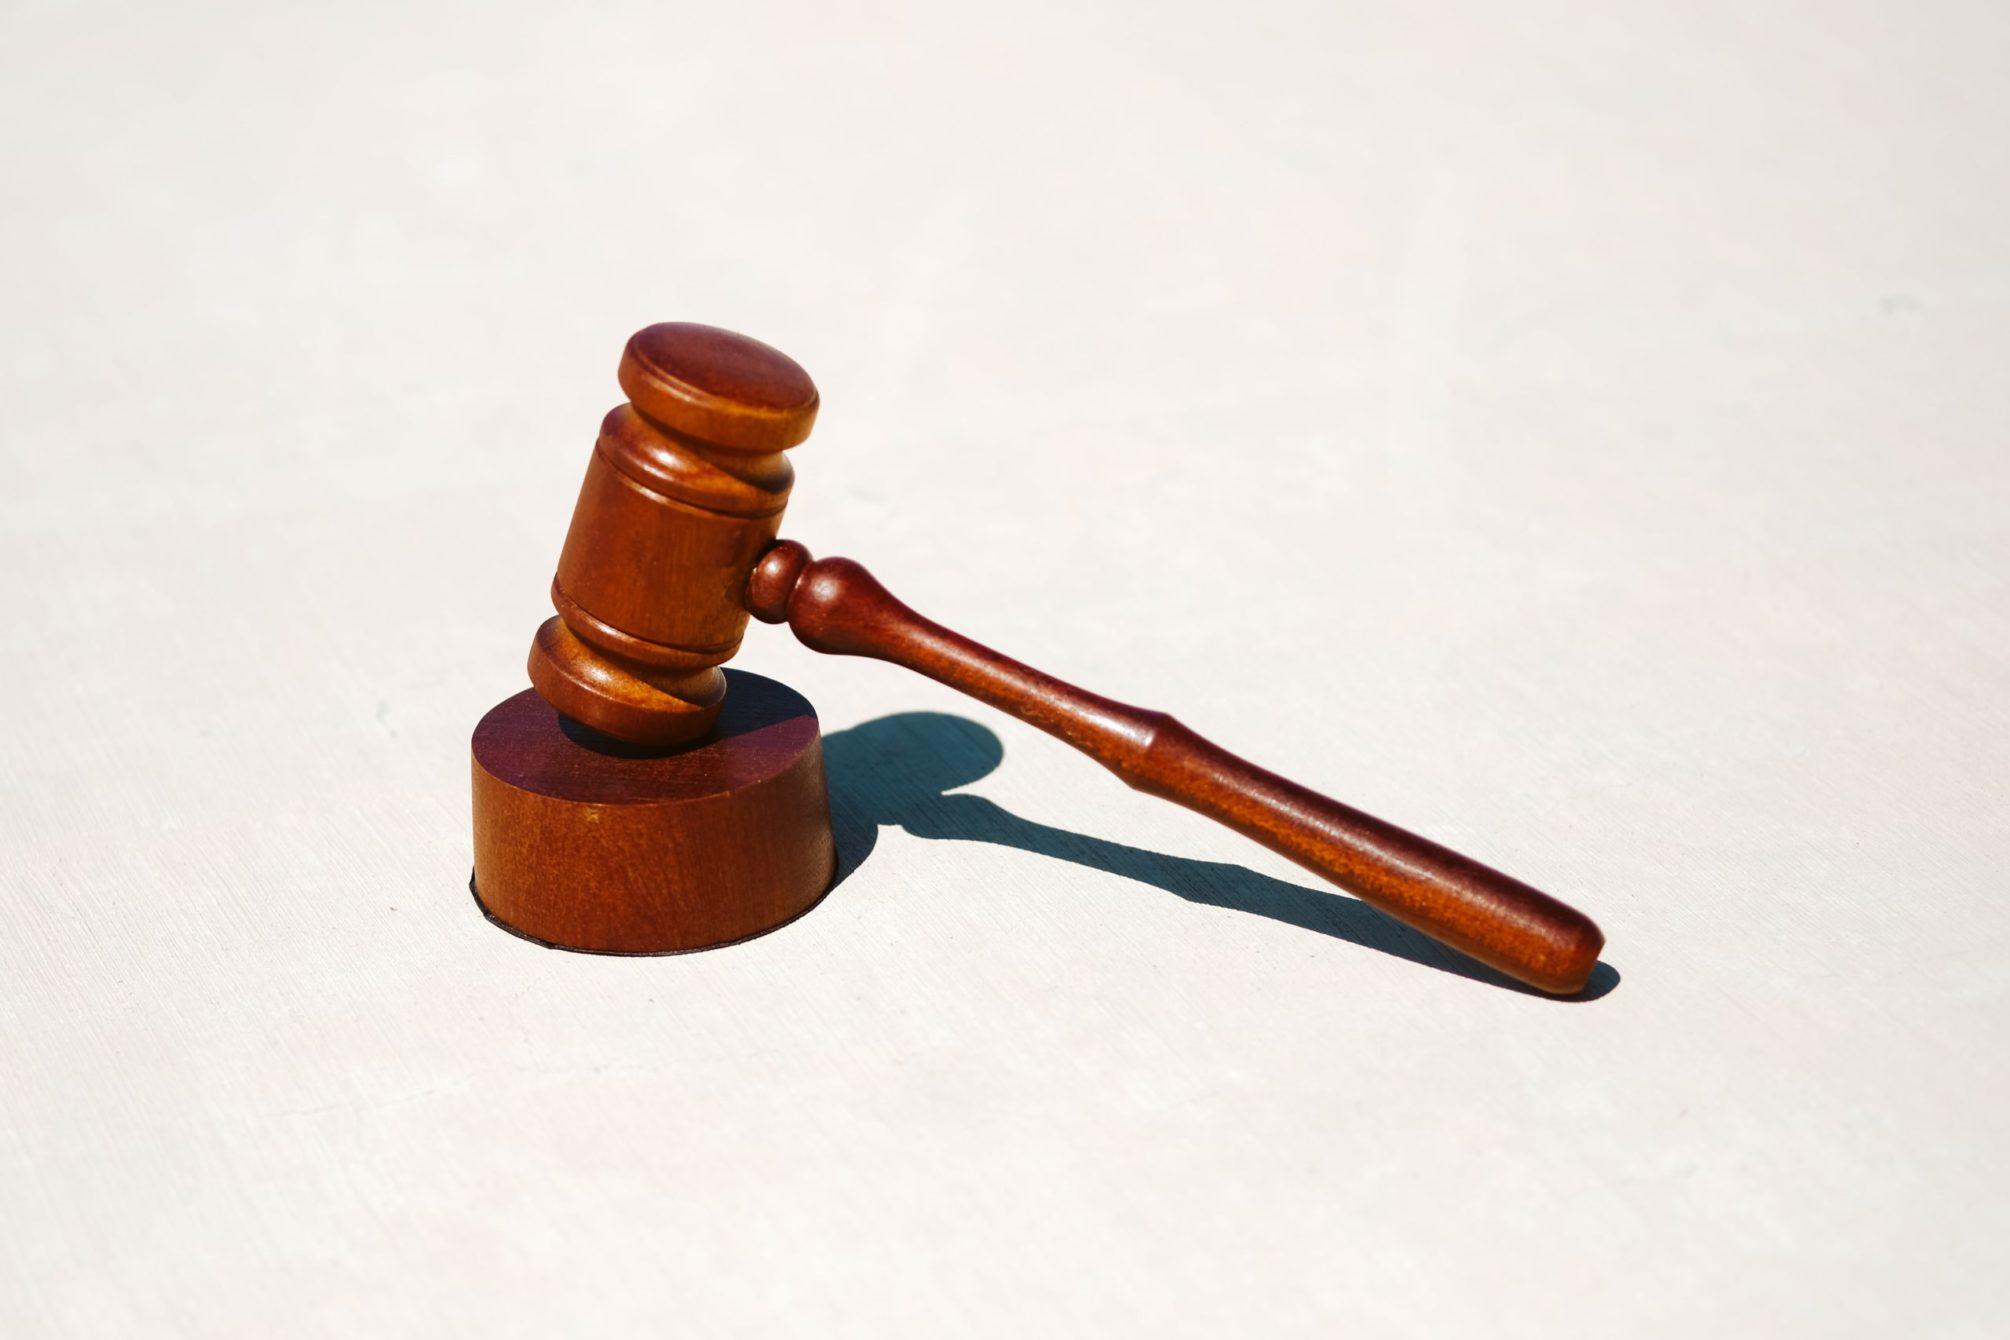 Stappenplan online scheiden | Scheiden met Aandacht